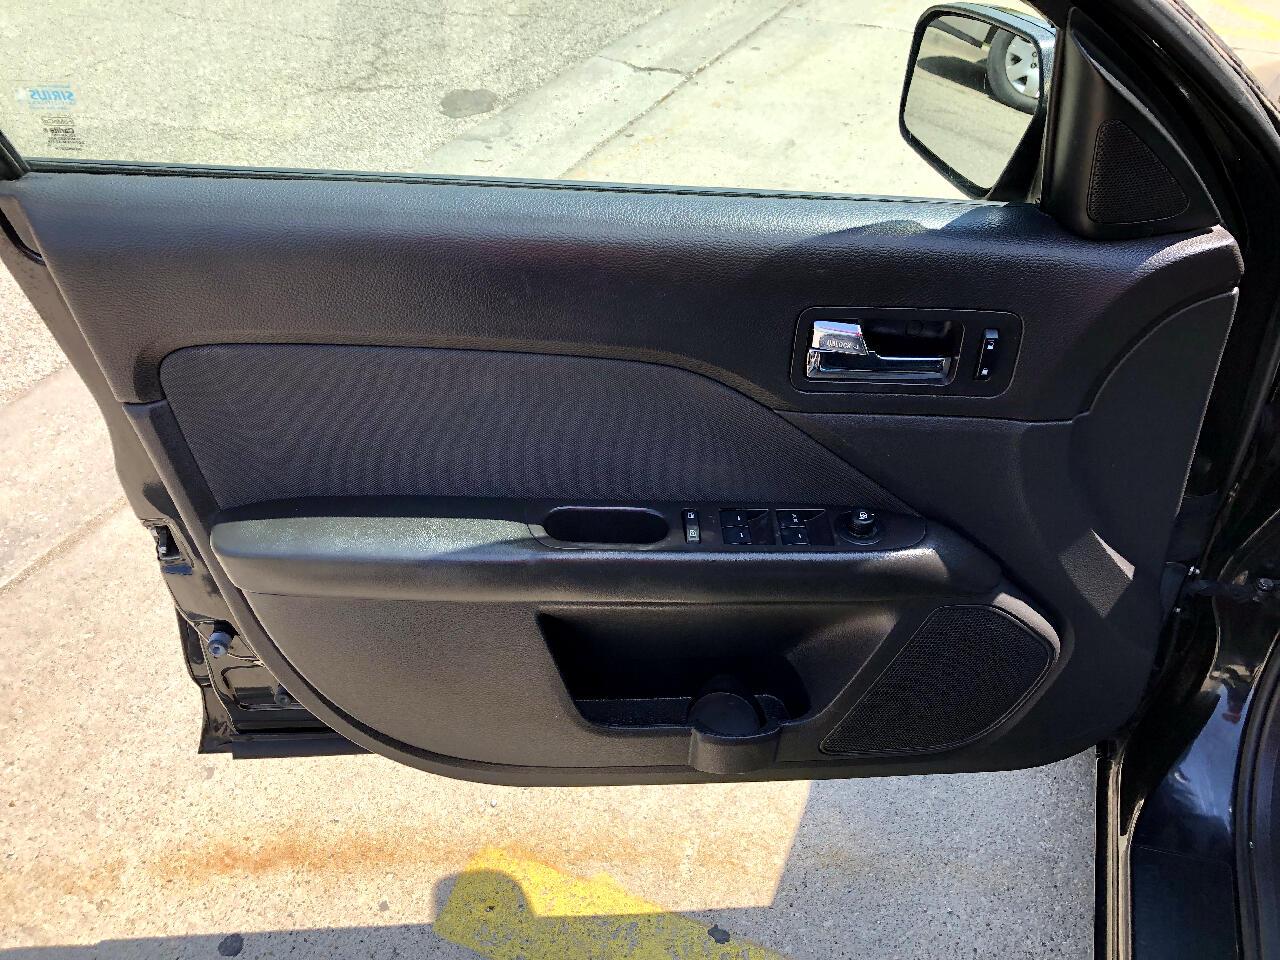 Ford Fusion 4dr Sdn SE FWD 2010